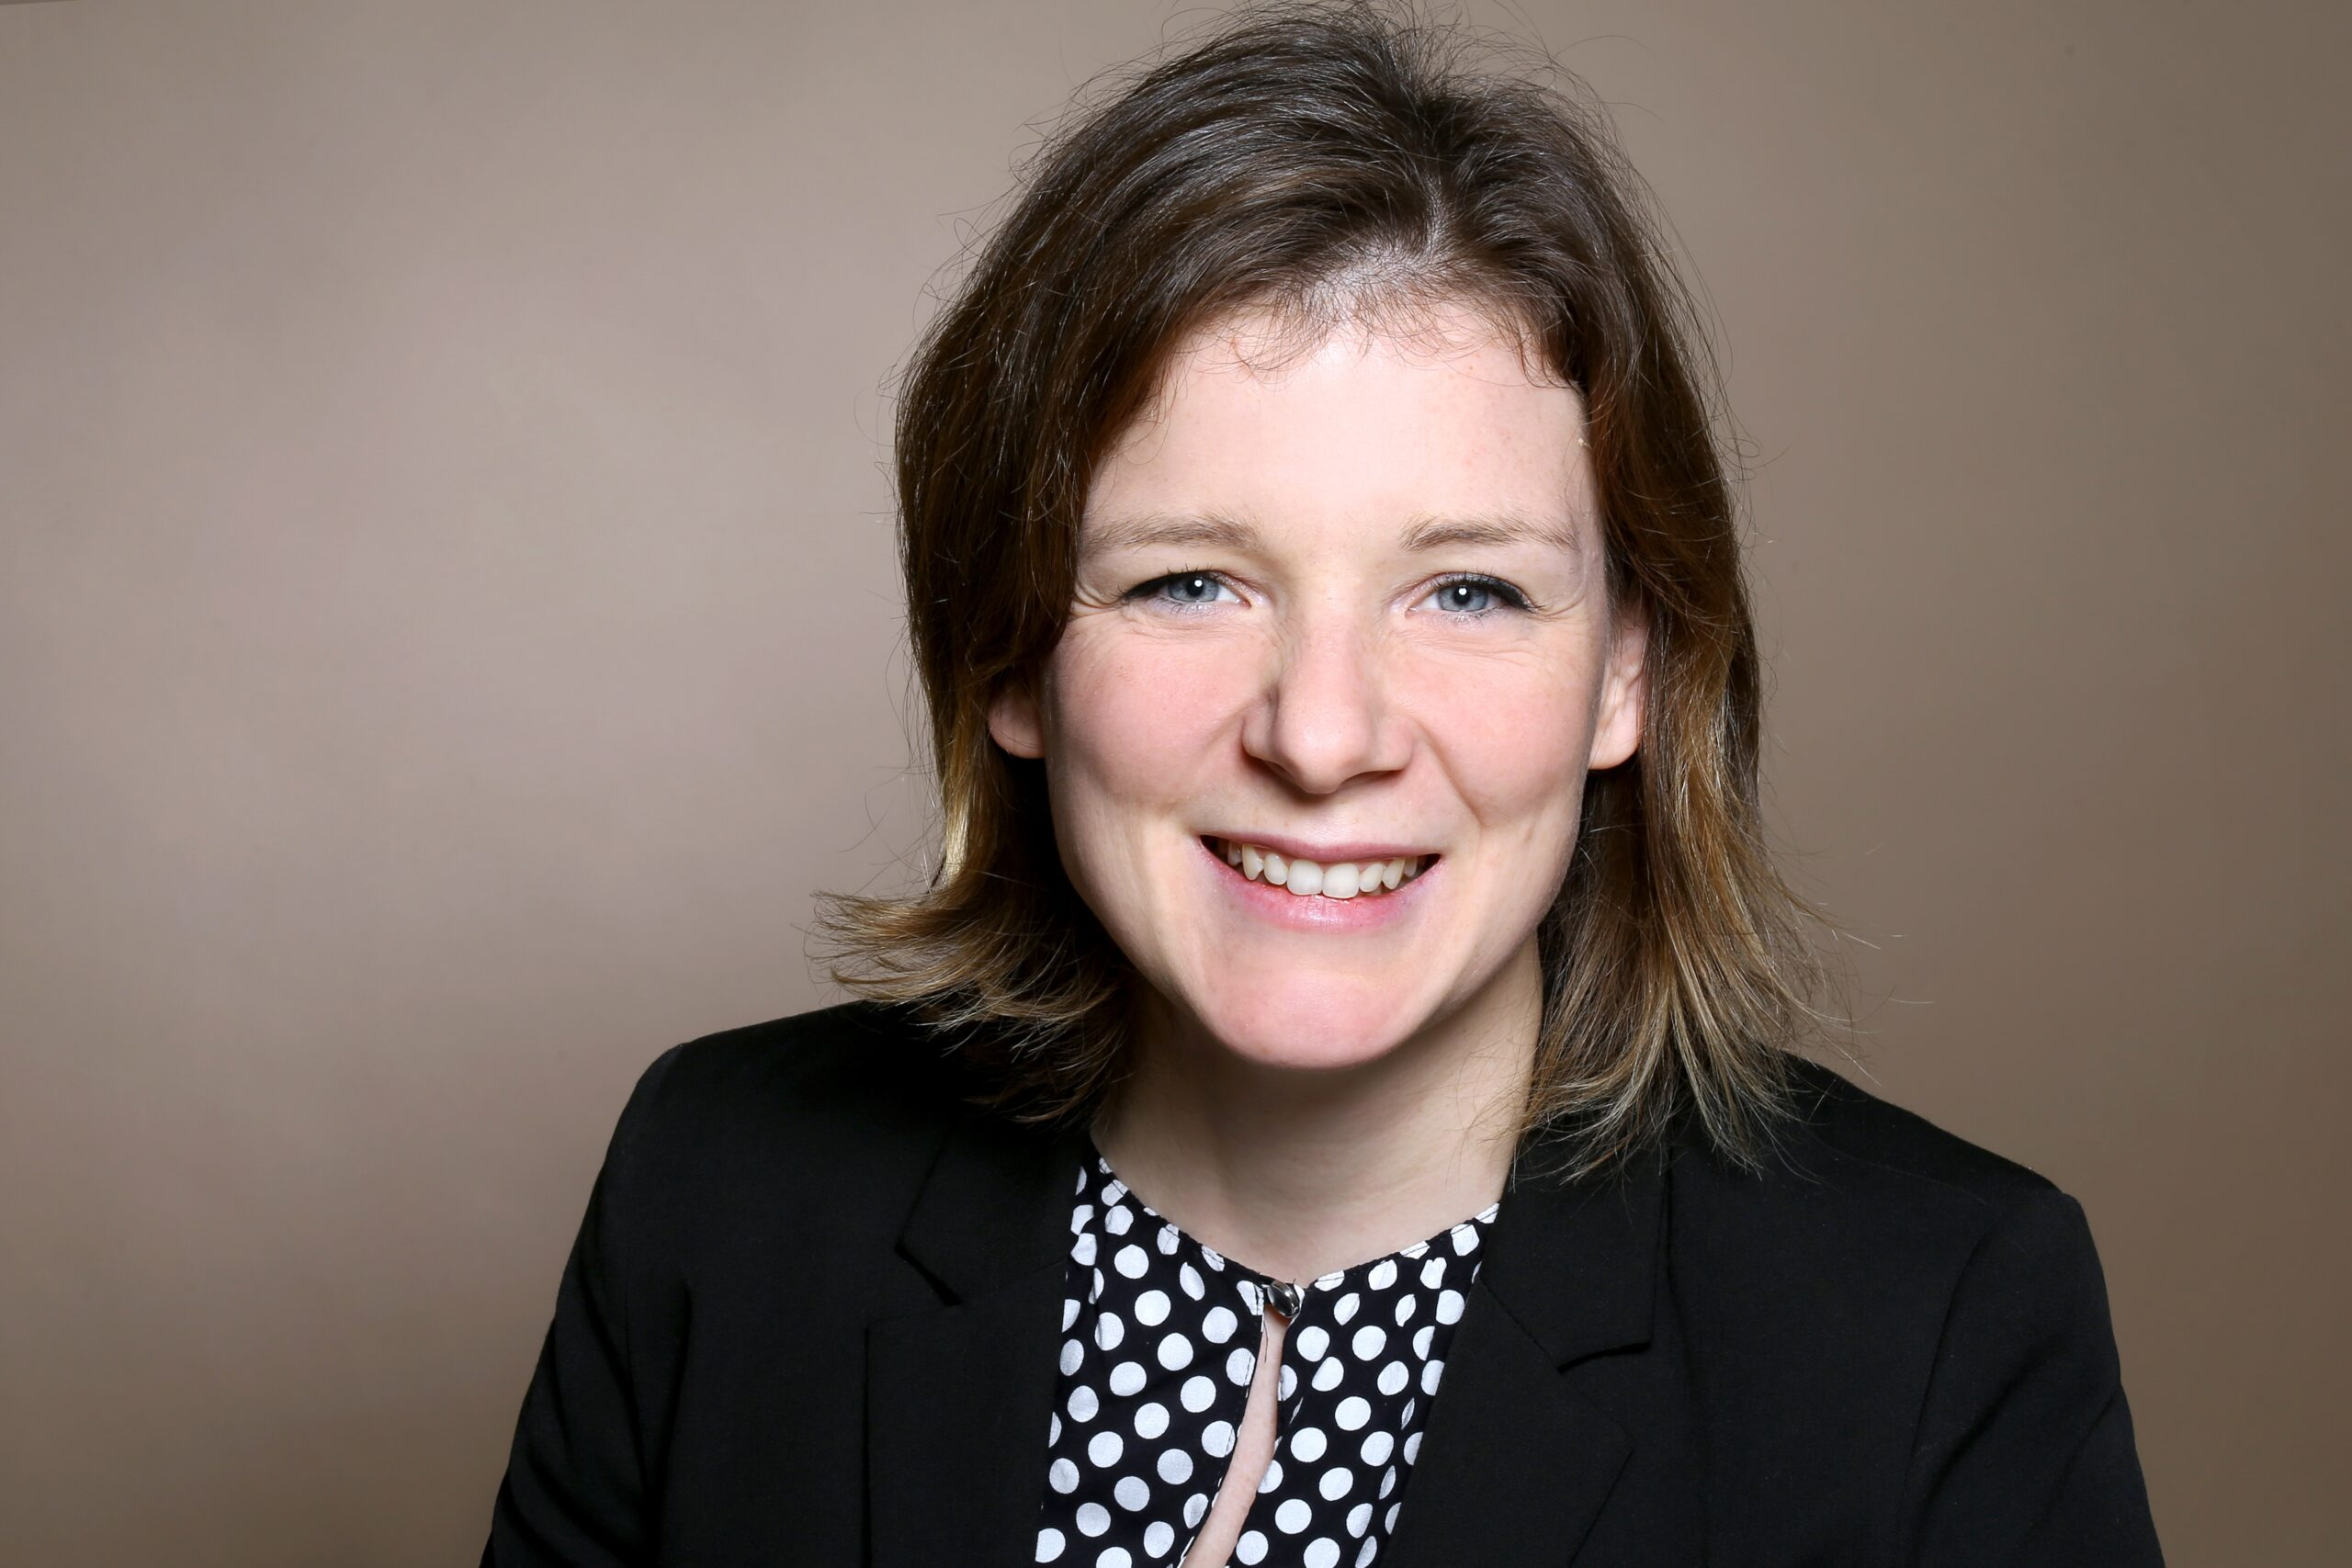 Christiana Krack